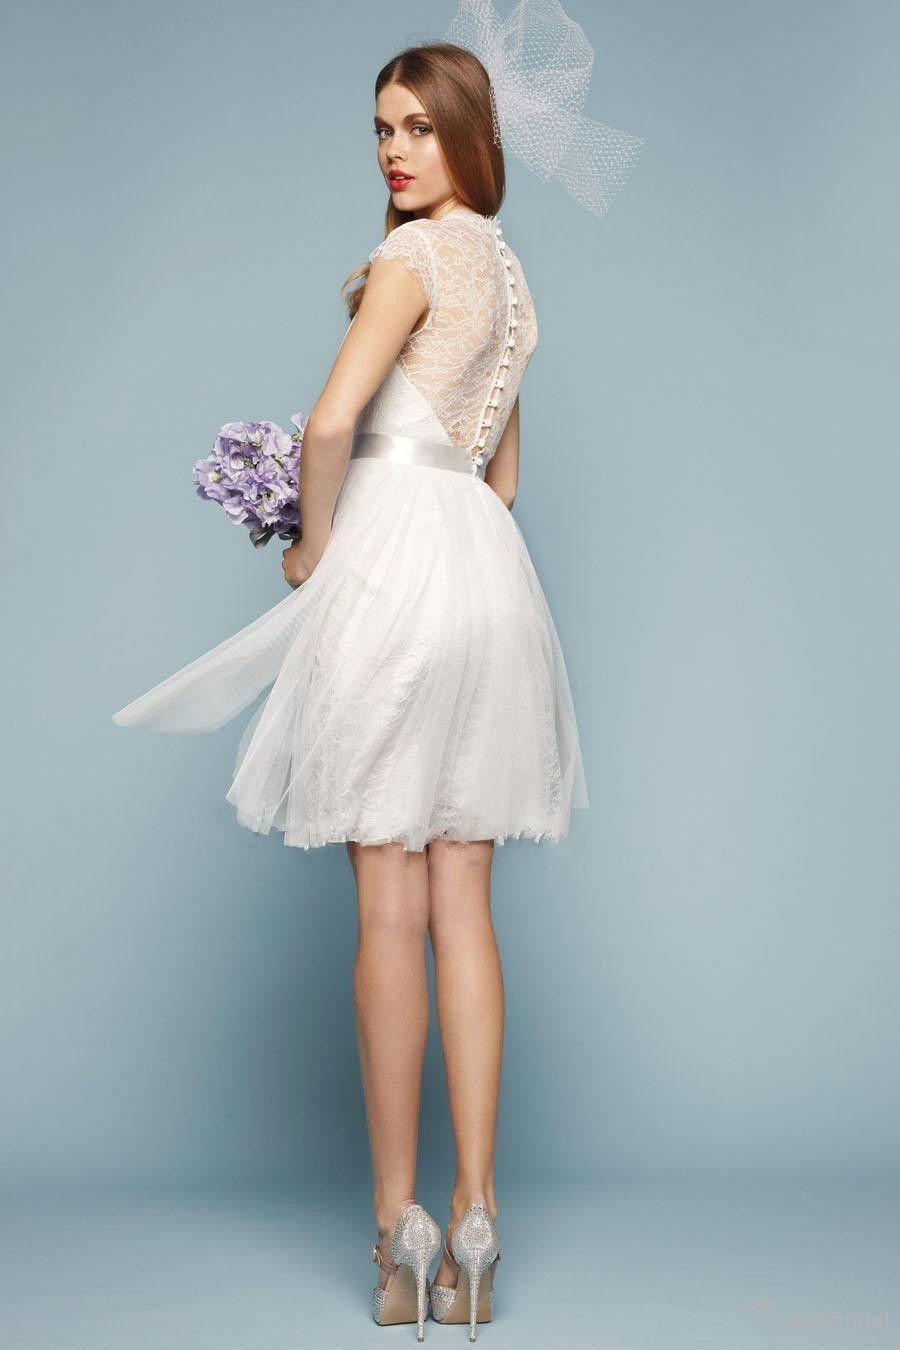 wedding gowns Short Wedding Dress Colors http www redwatchonline org short